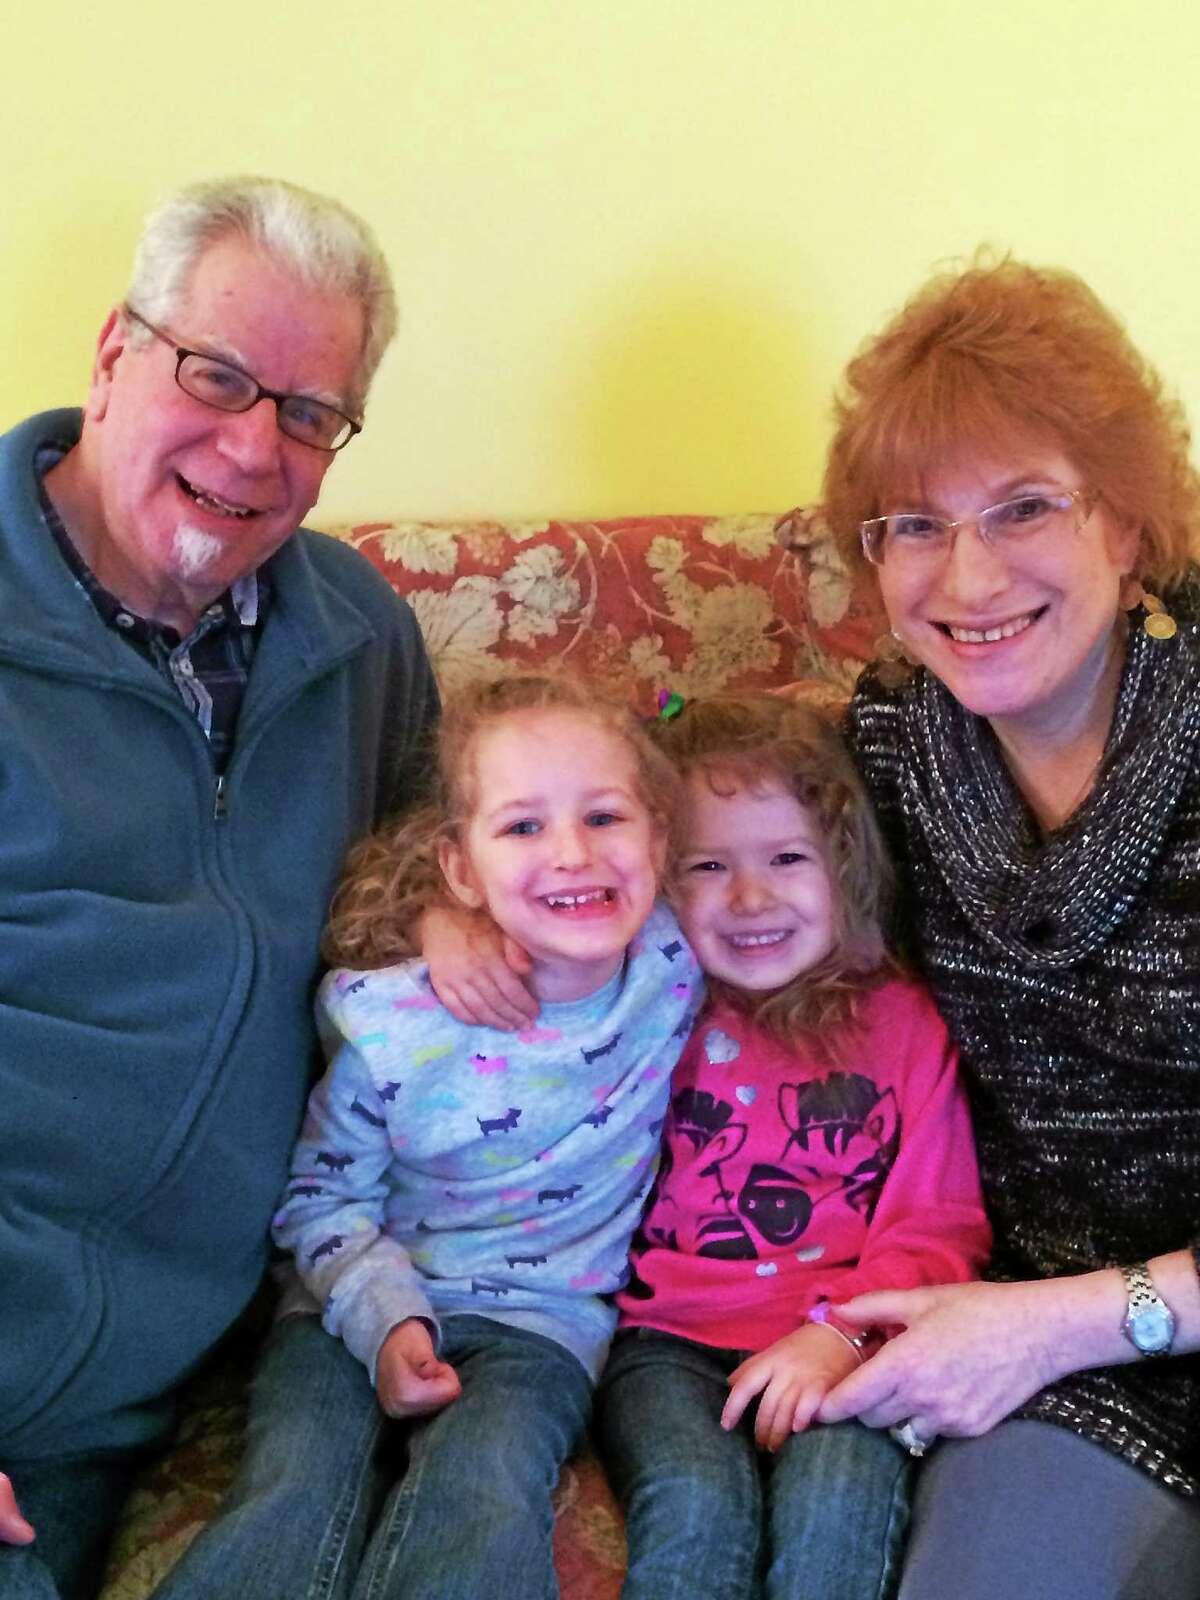 Joel and Barbara Levitt with grandchildren Haley and Briella Bittner.